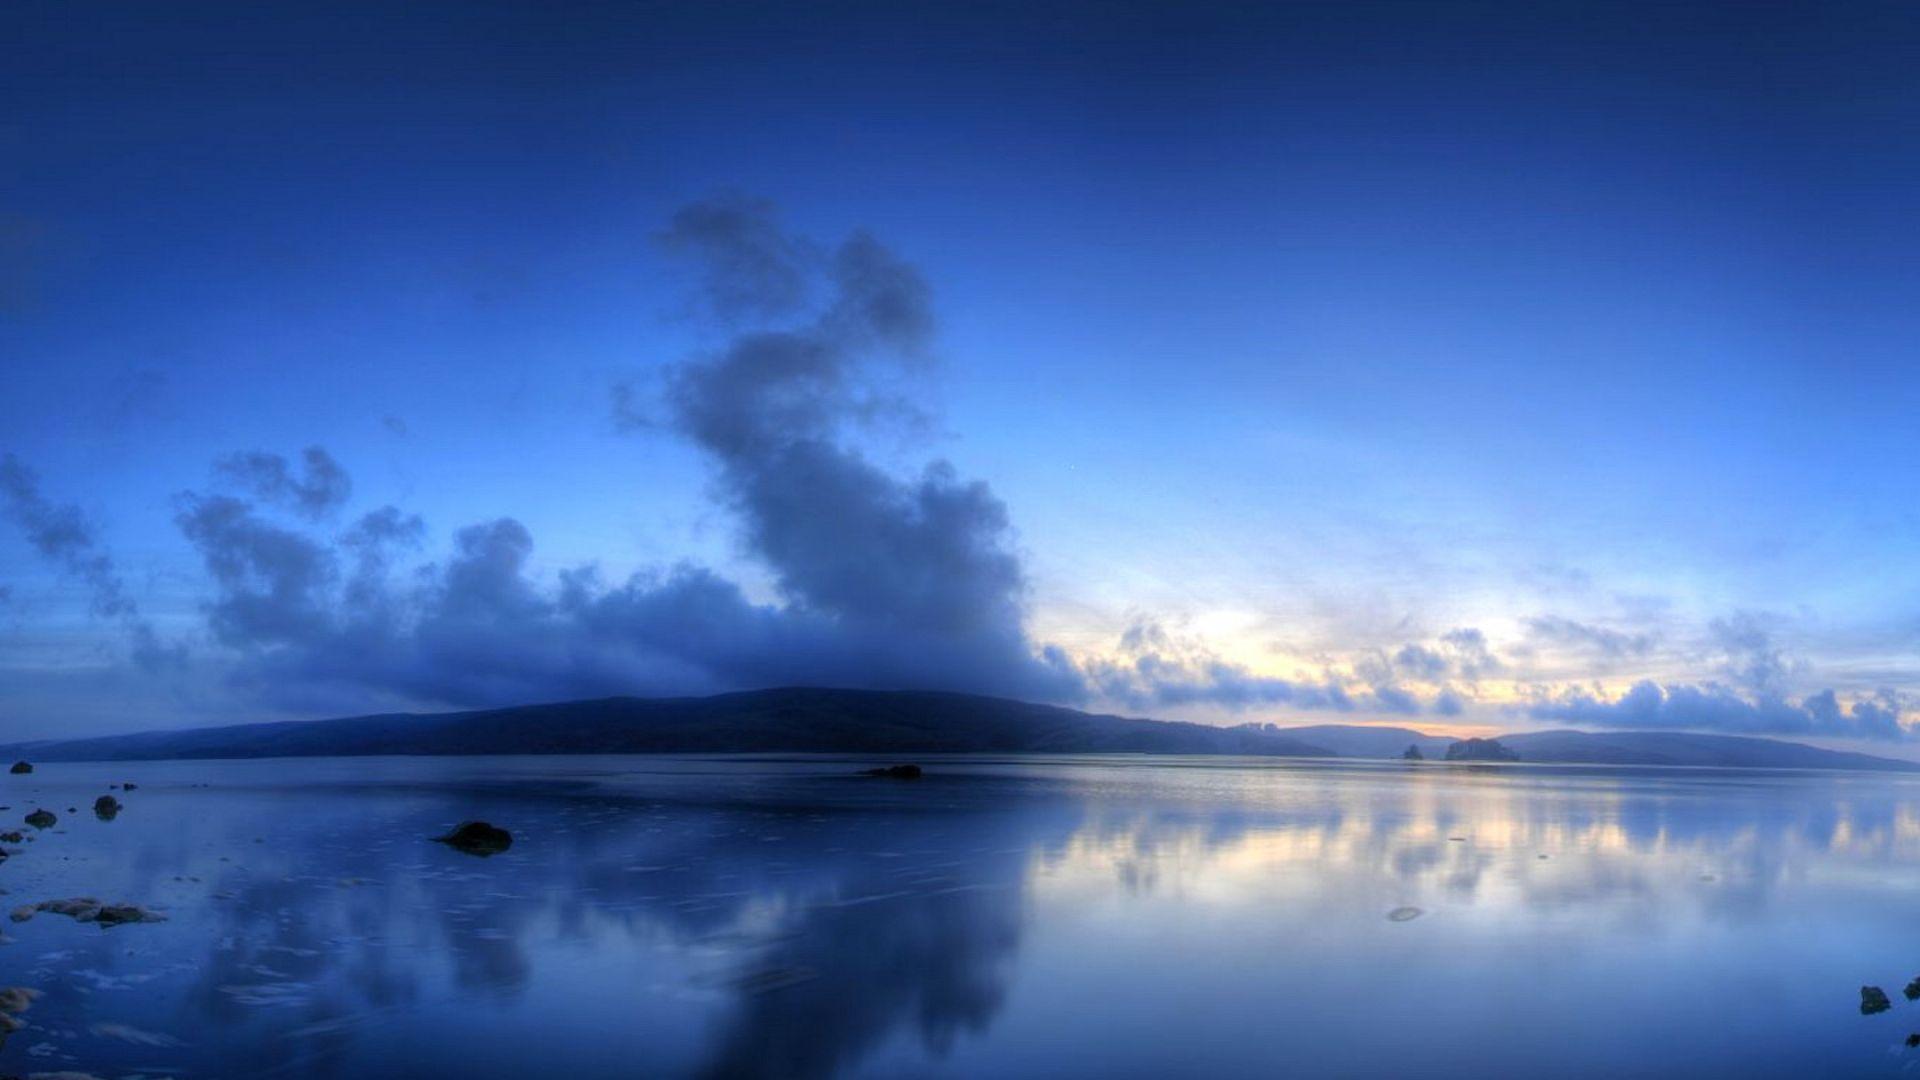 Blue Sky Photo On Your Desktop